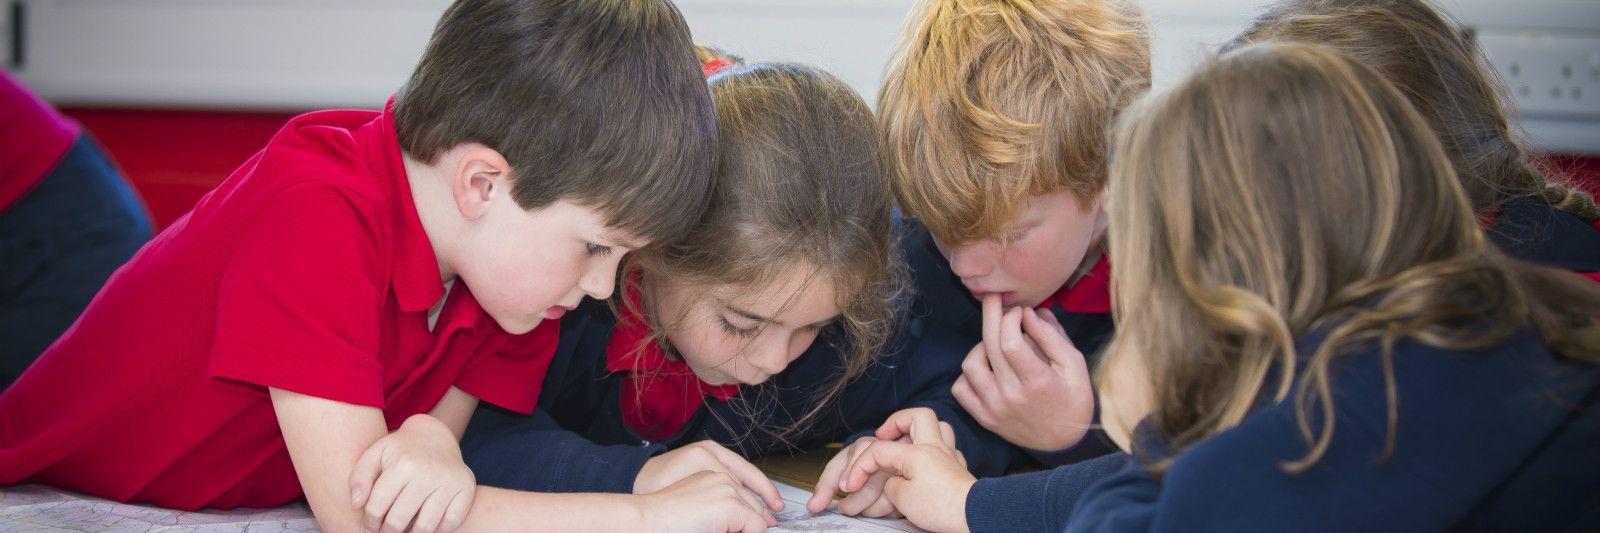 Oundle CE Primary School Parent Feedback